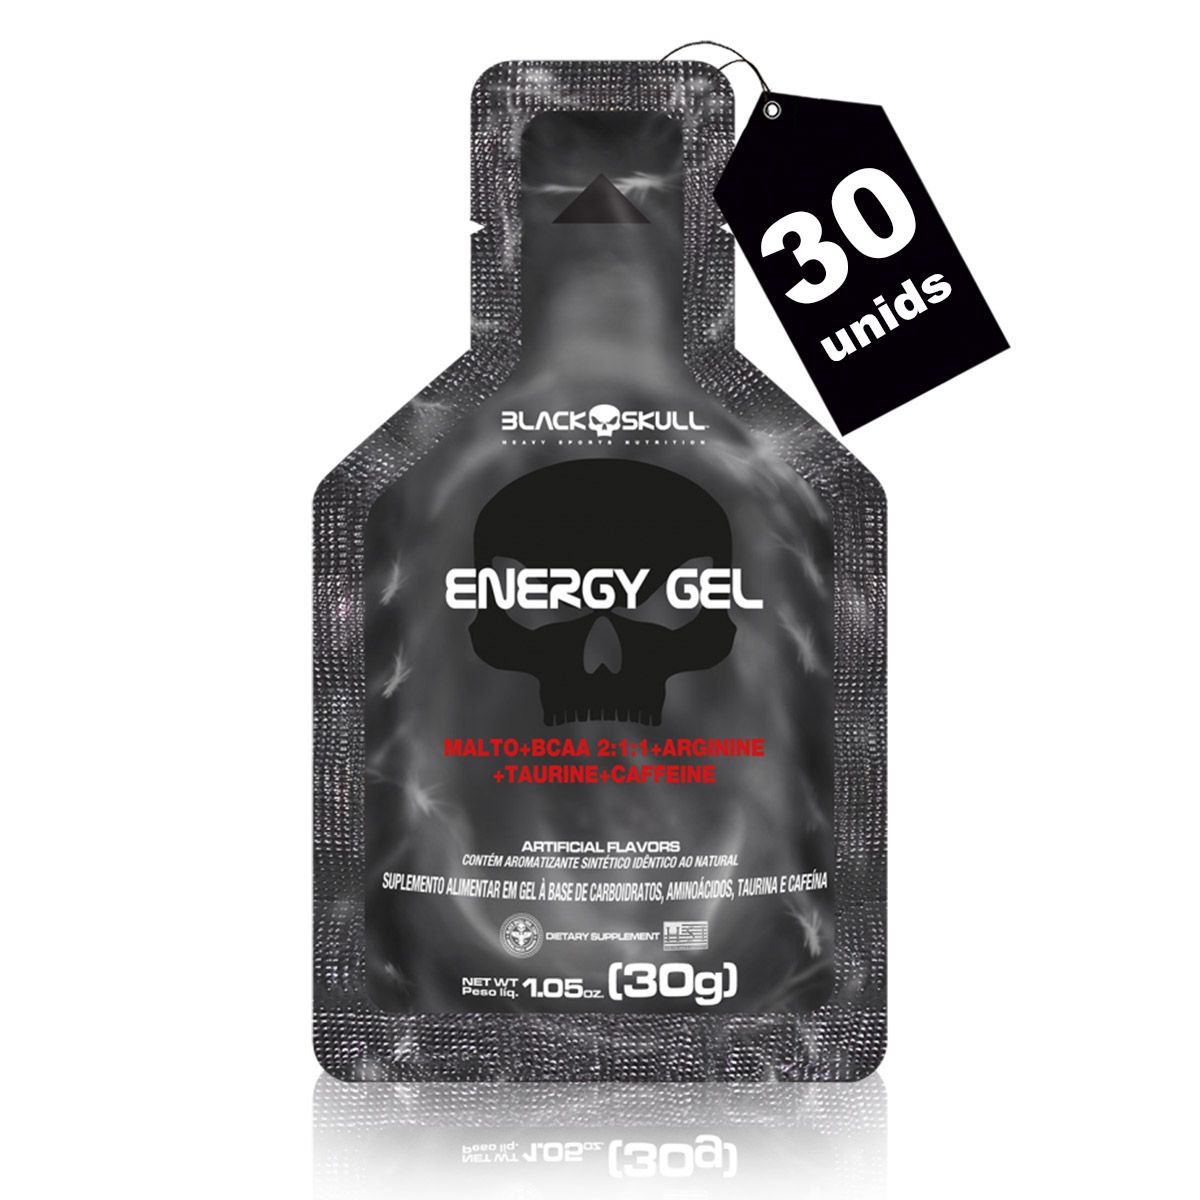 Combo 3x Energy Gel (Caixa com 10 unidades de 30g) - Black Skull